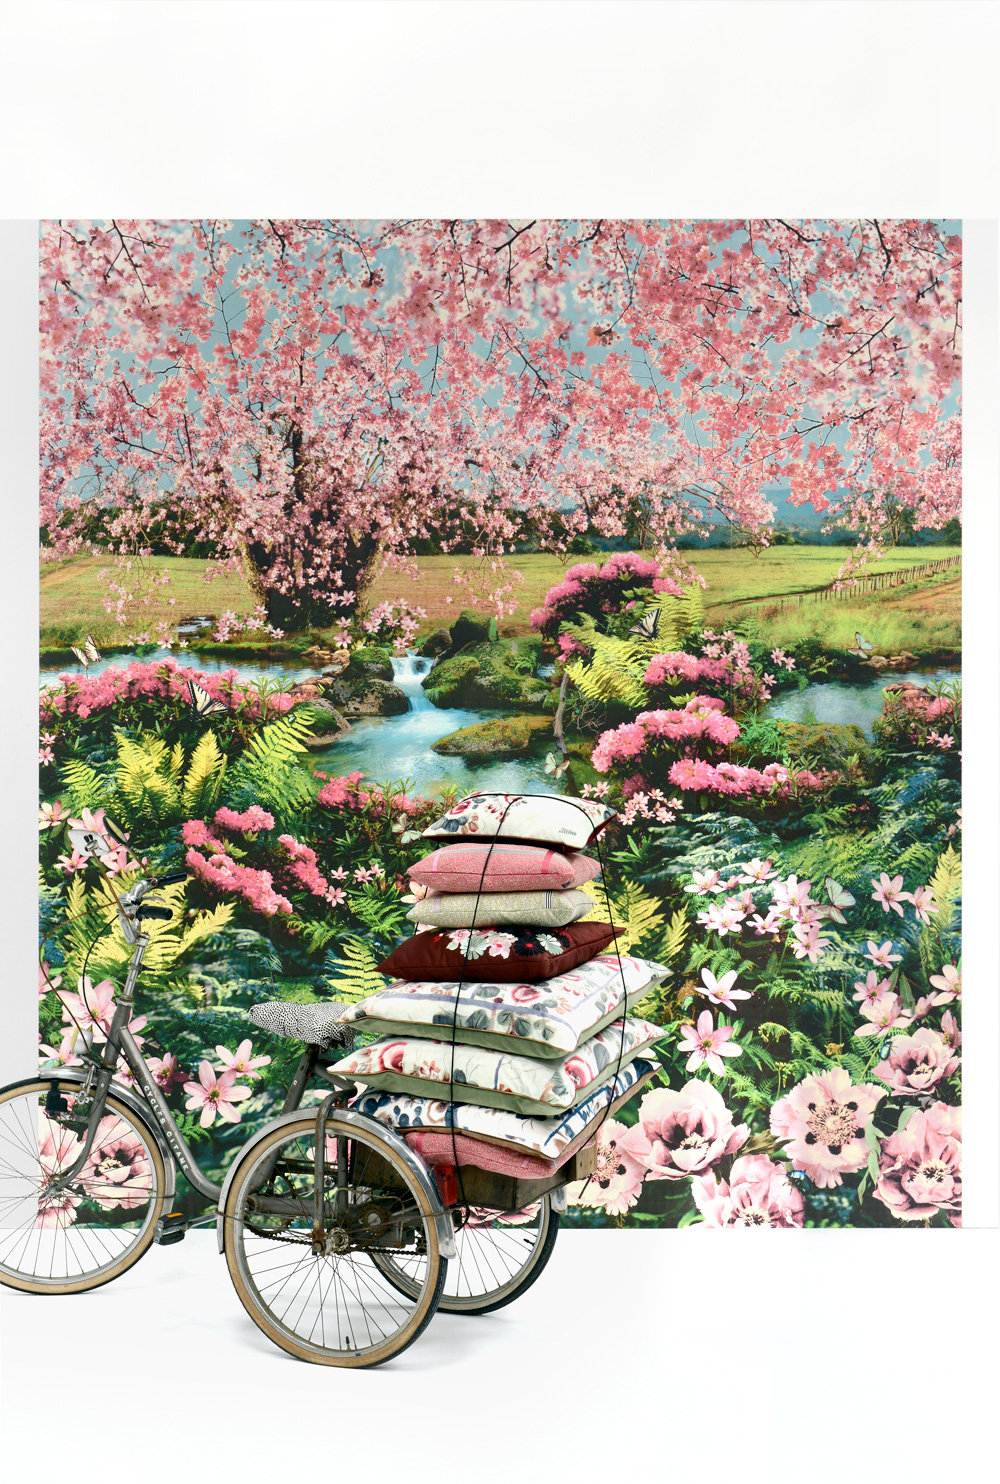 Jean Paul Gaultier Festival Multicolour Mural - Product code: 3319/01